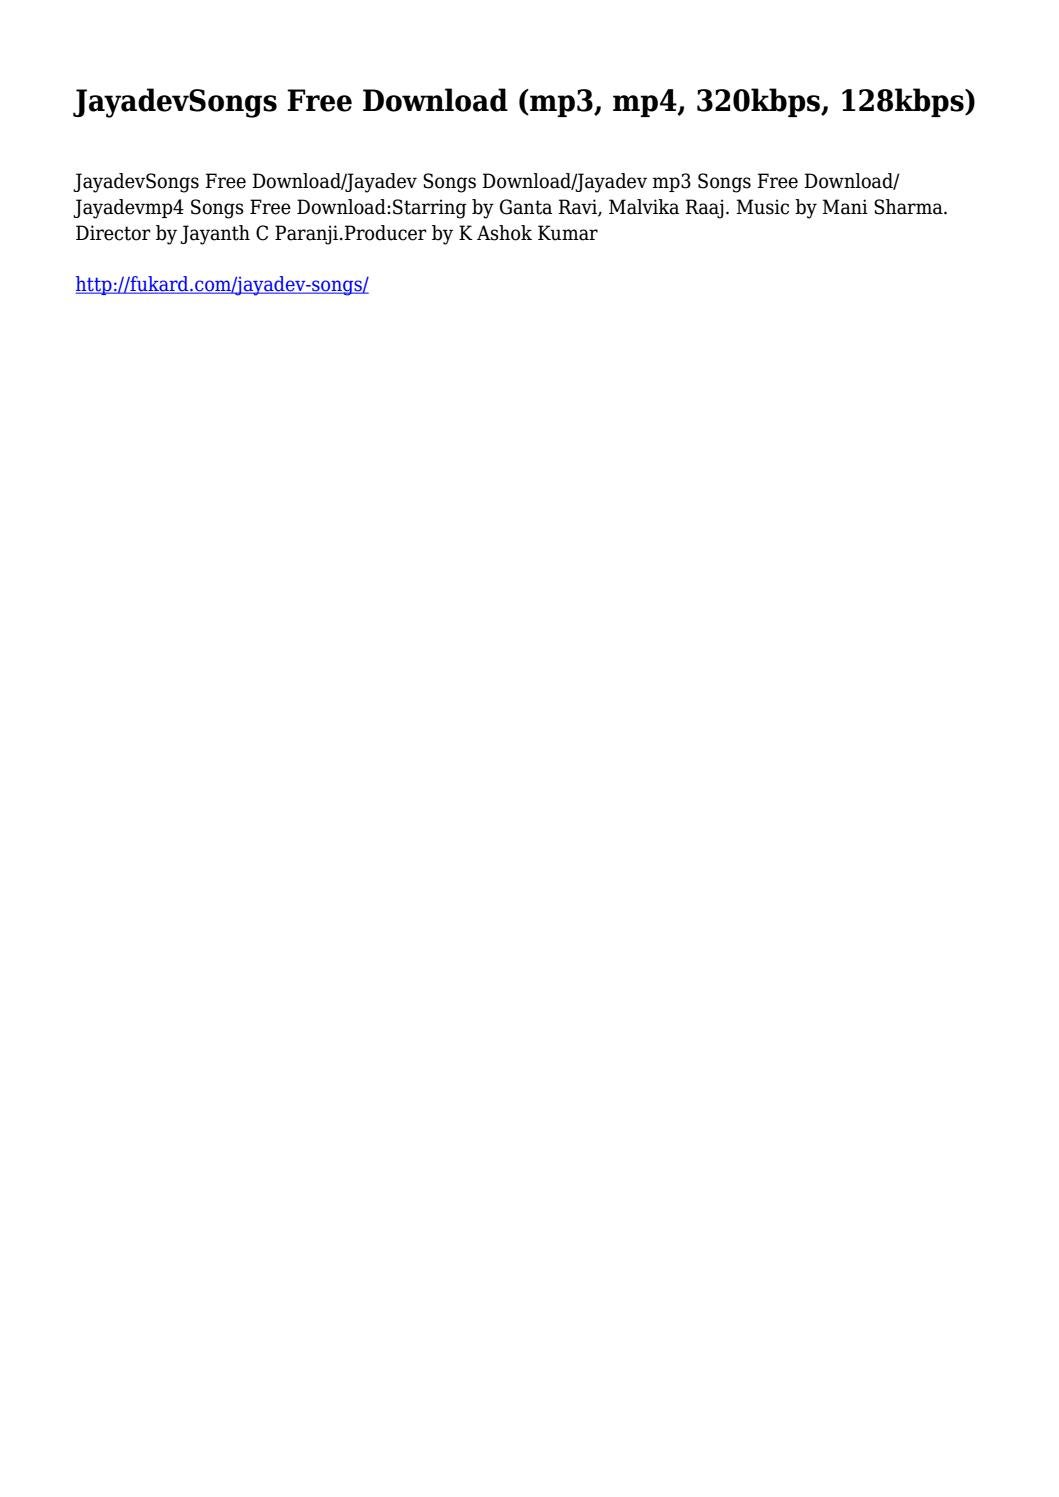 JayadevSongs Free Download (mp3, mp4, 320kbps, 128kbps)... by  gruesomeswamp8522 - issuu